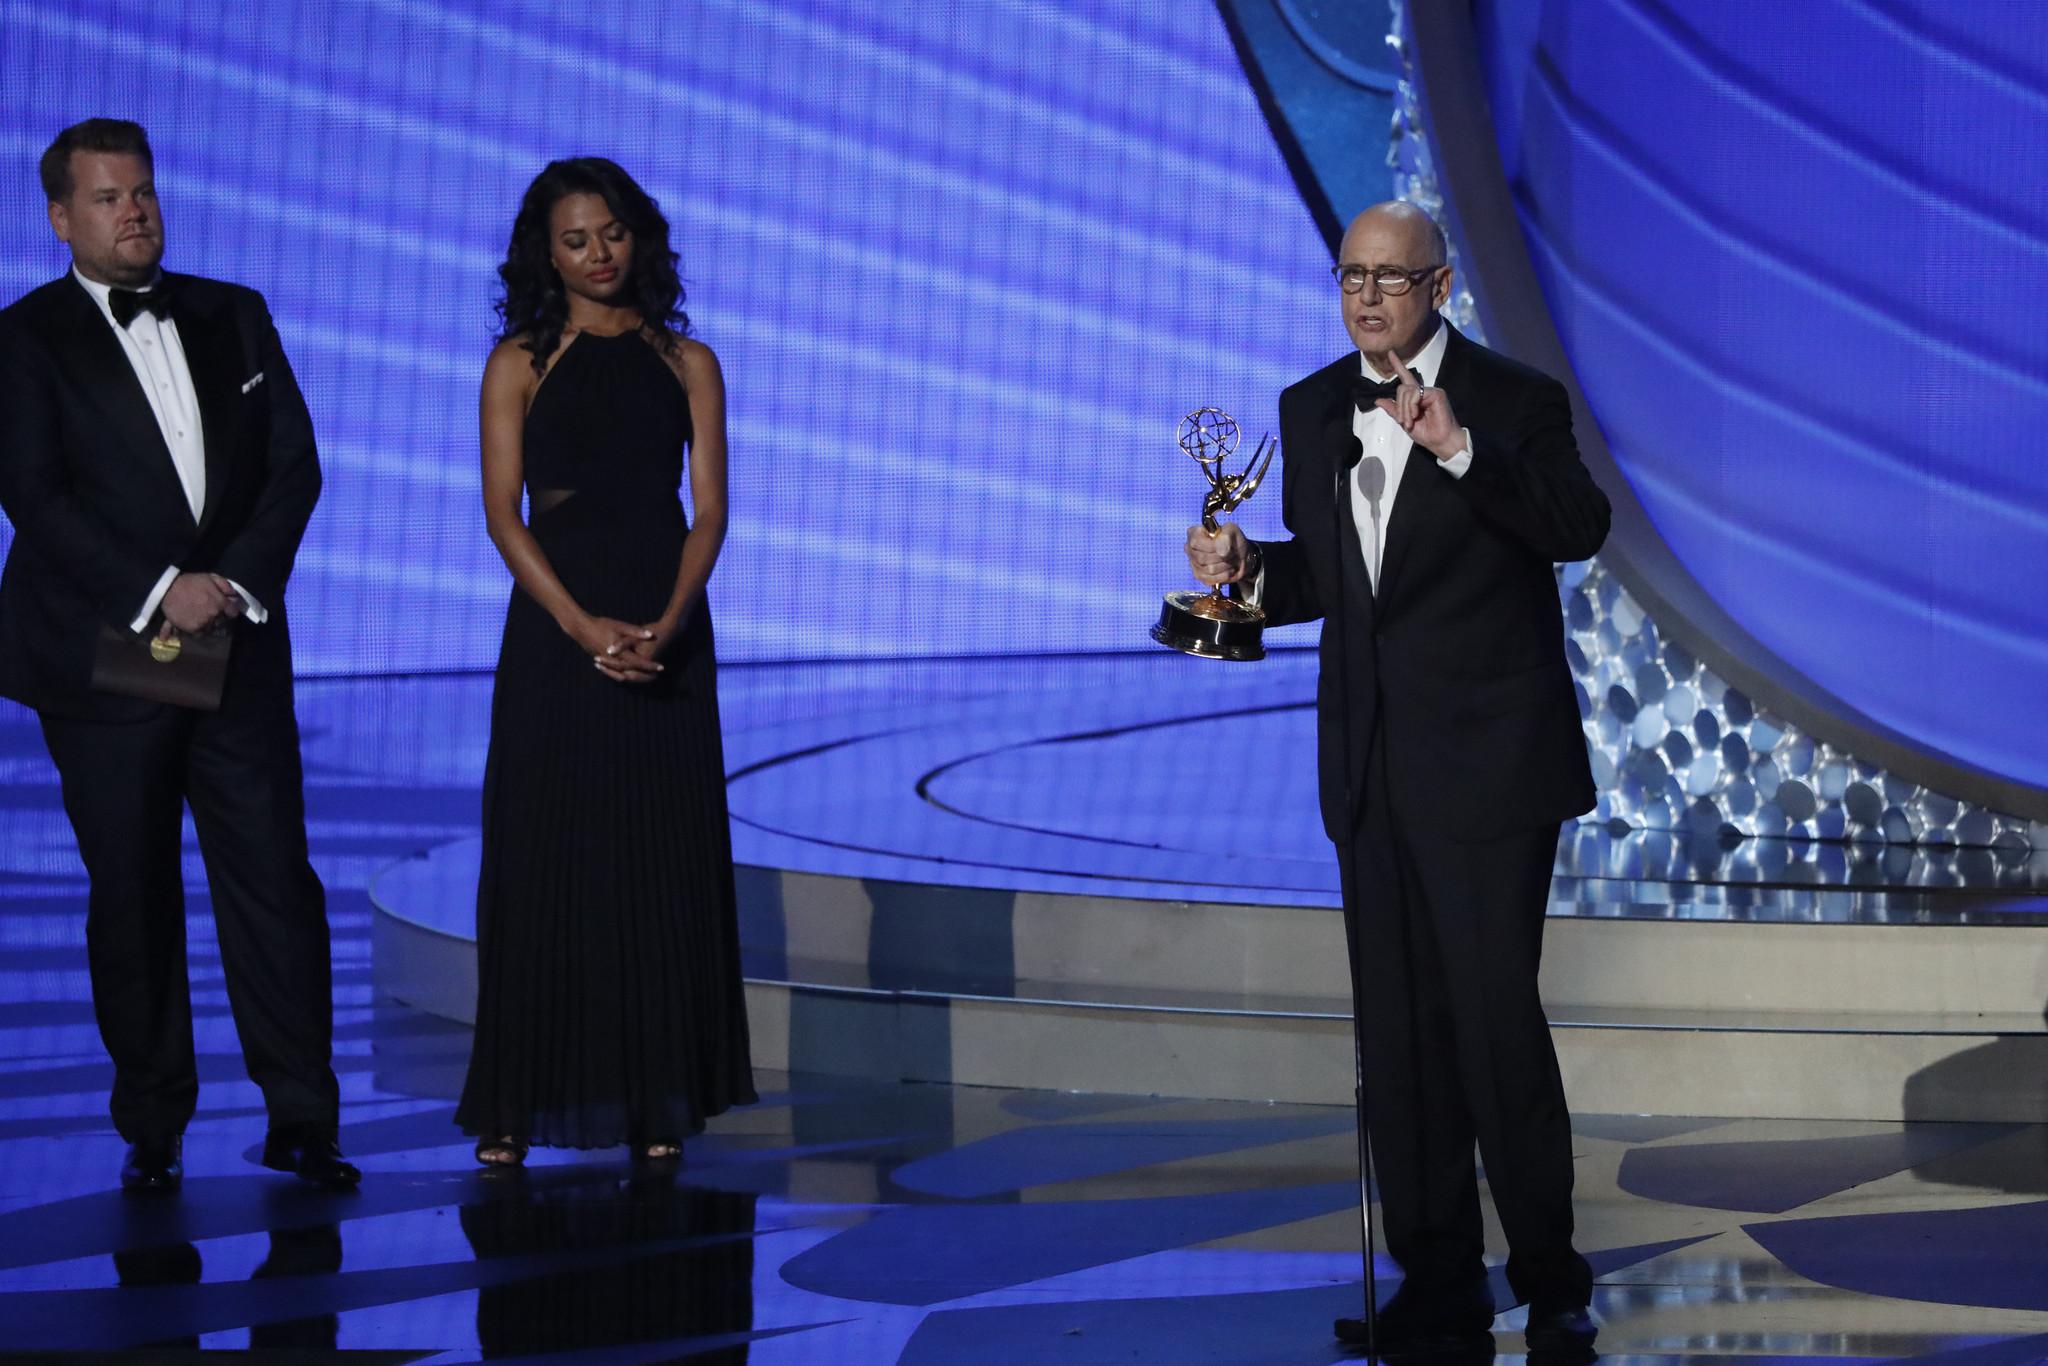 Jeffrey Tambor giving his Emmy acceptance speech in 2016.